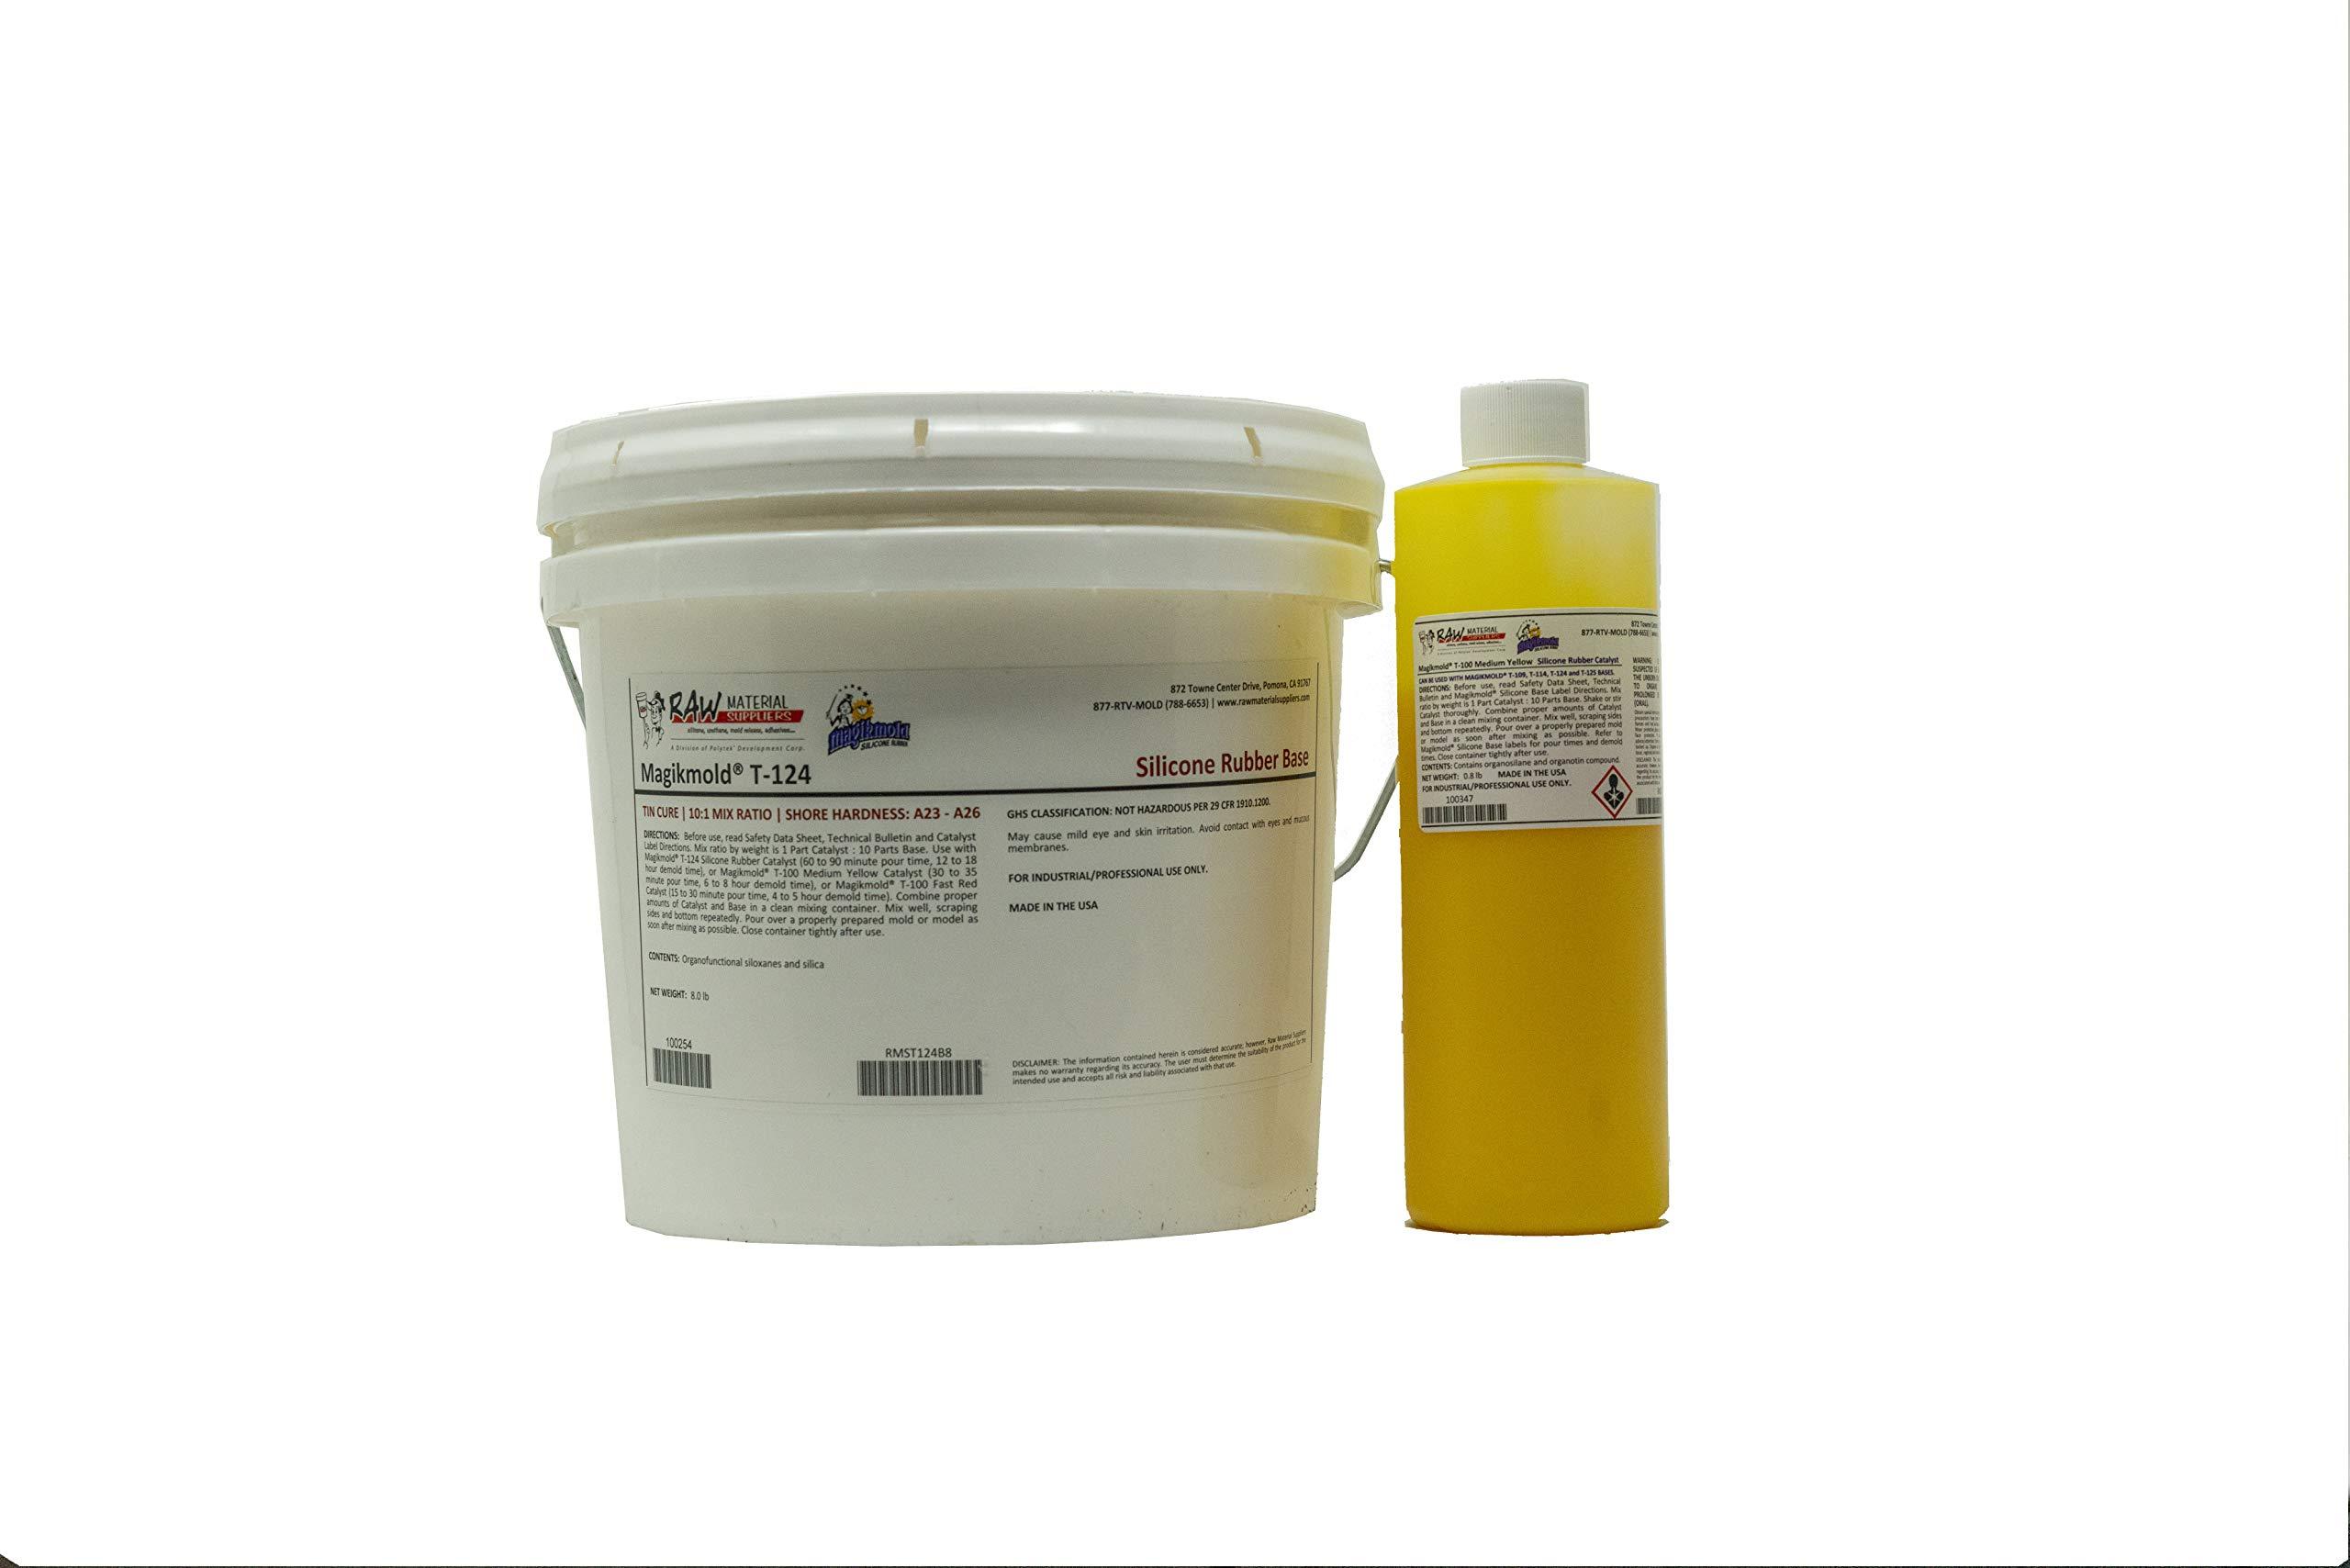 Magikmold T-124 Tin Cure Silicone - 8.8 lb Kit - Yellow Medium Catalyst